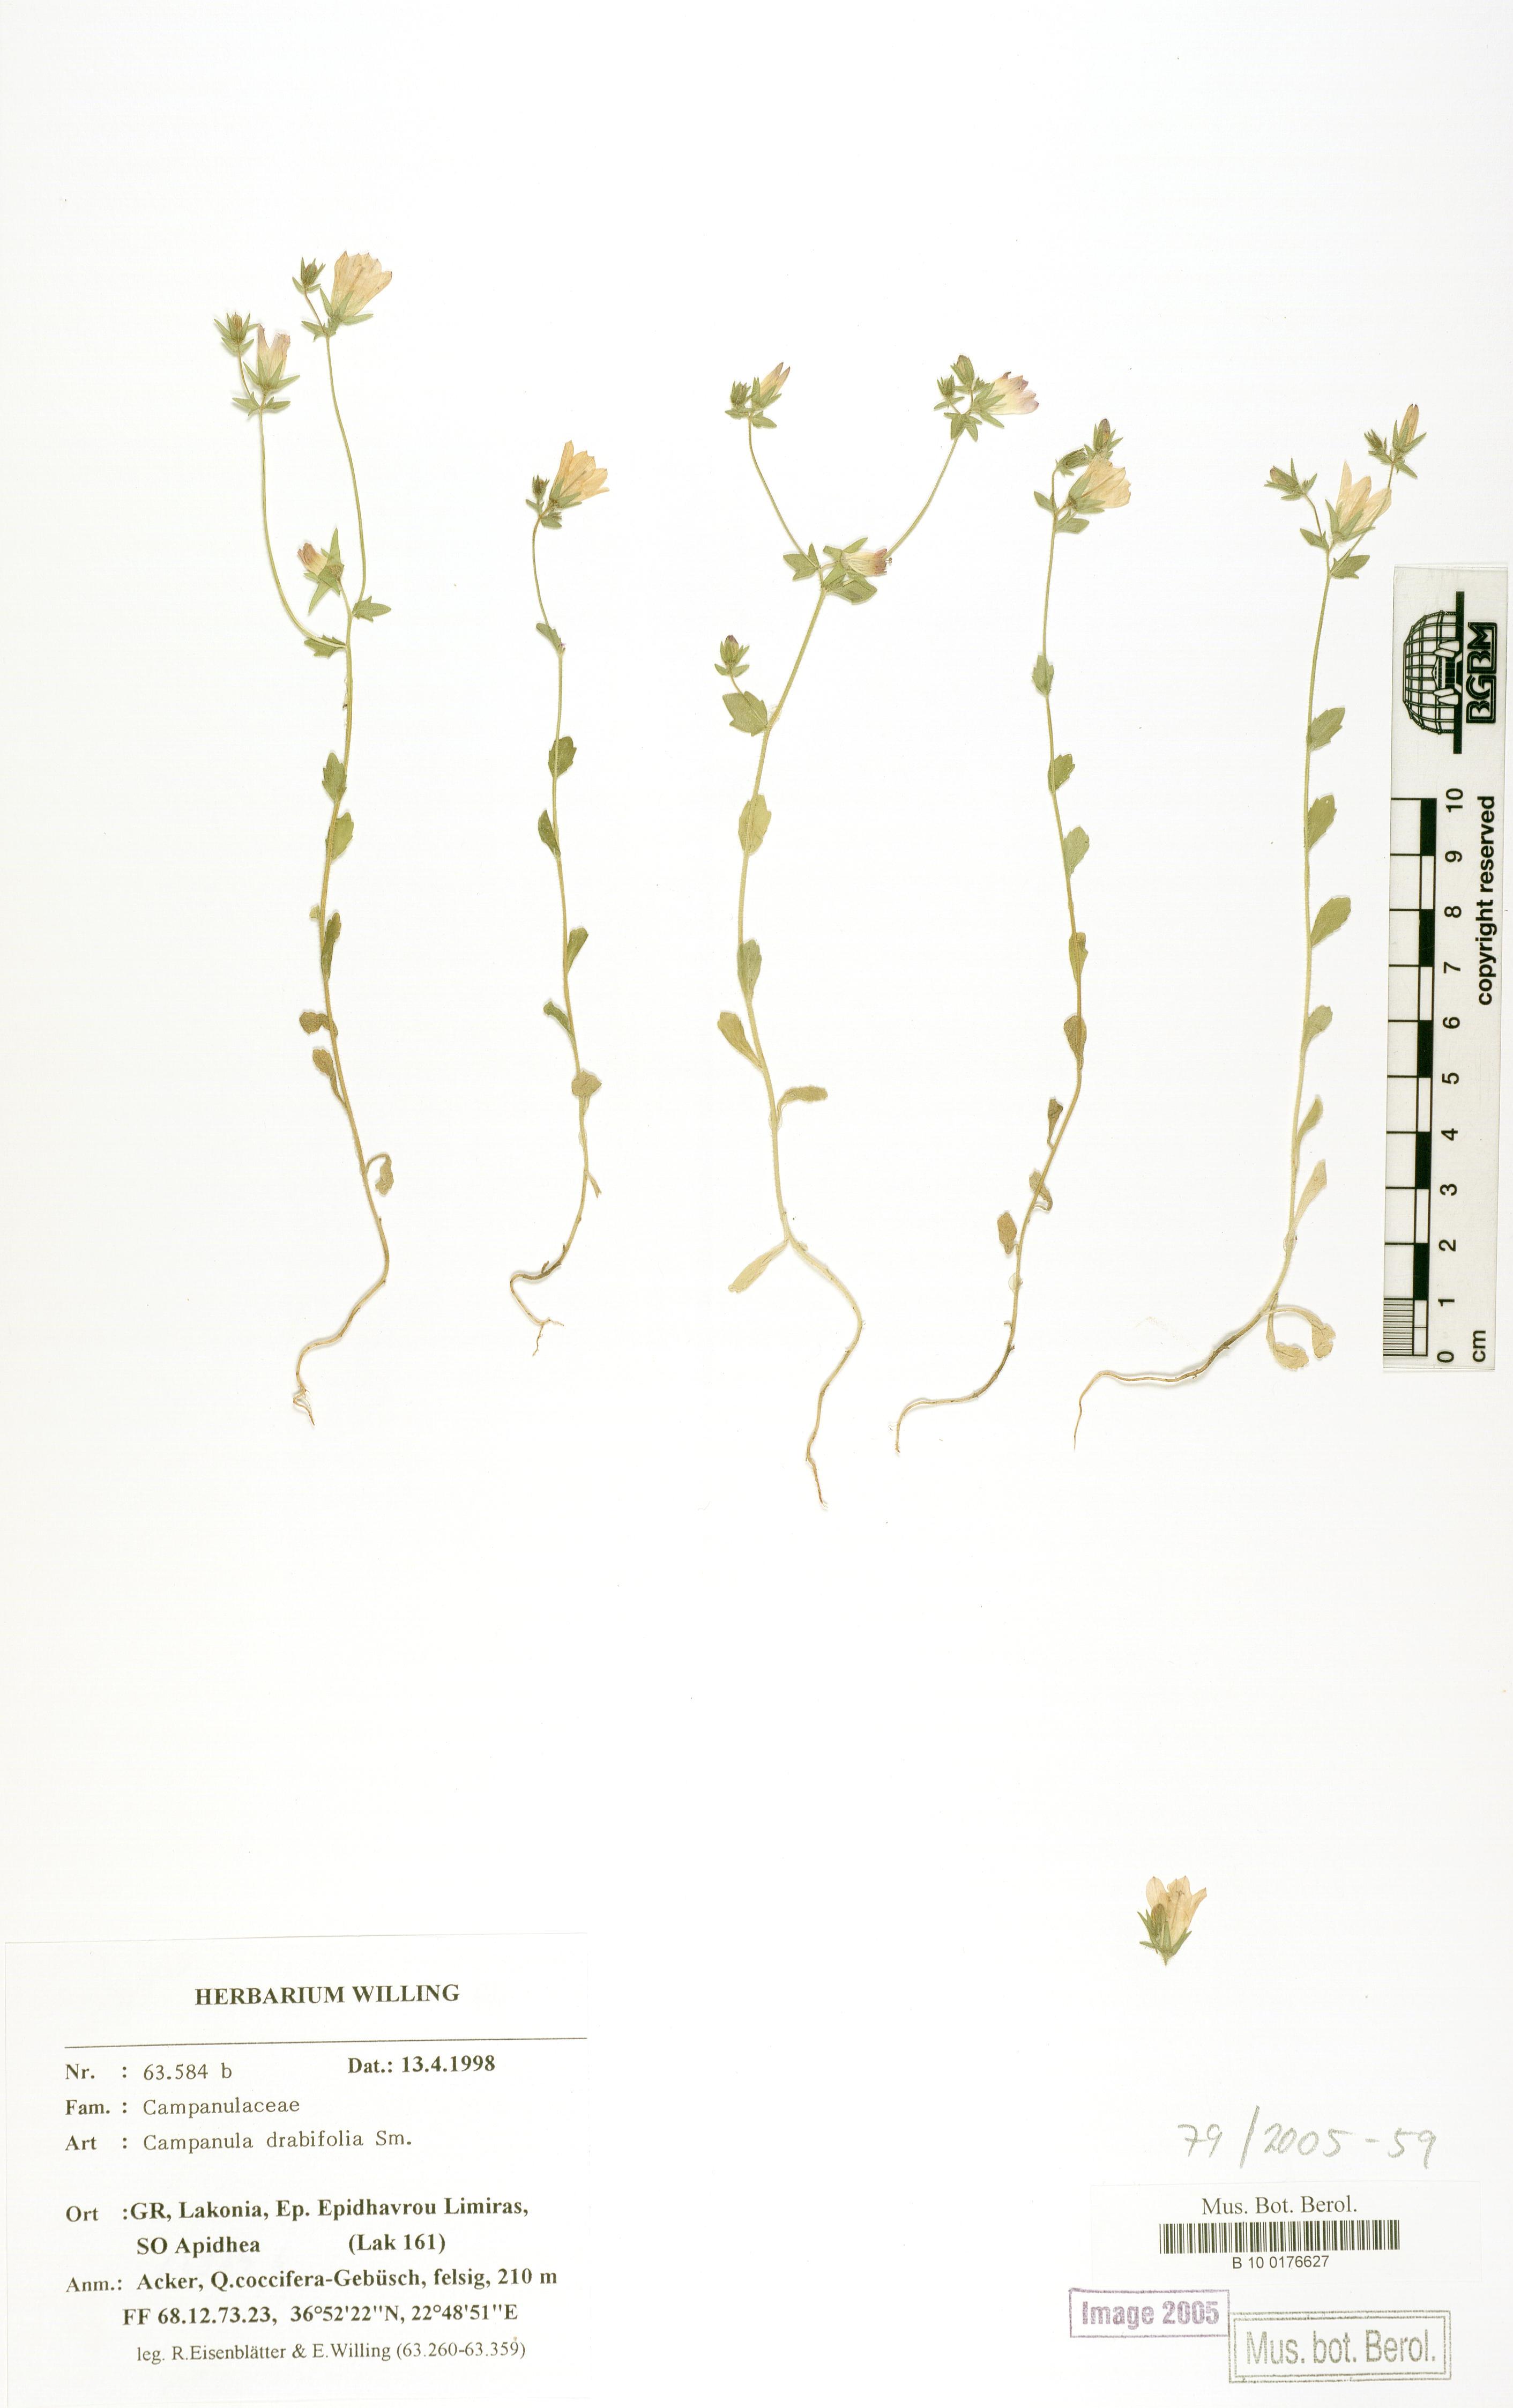 http://ww2.bgbm.org/herbarium/images/B/10/01/76/62/B_10_0176627.jpg